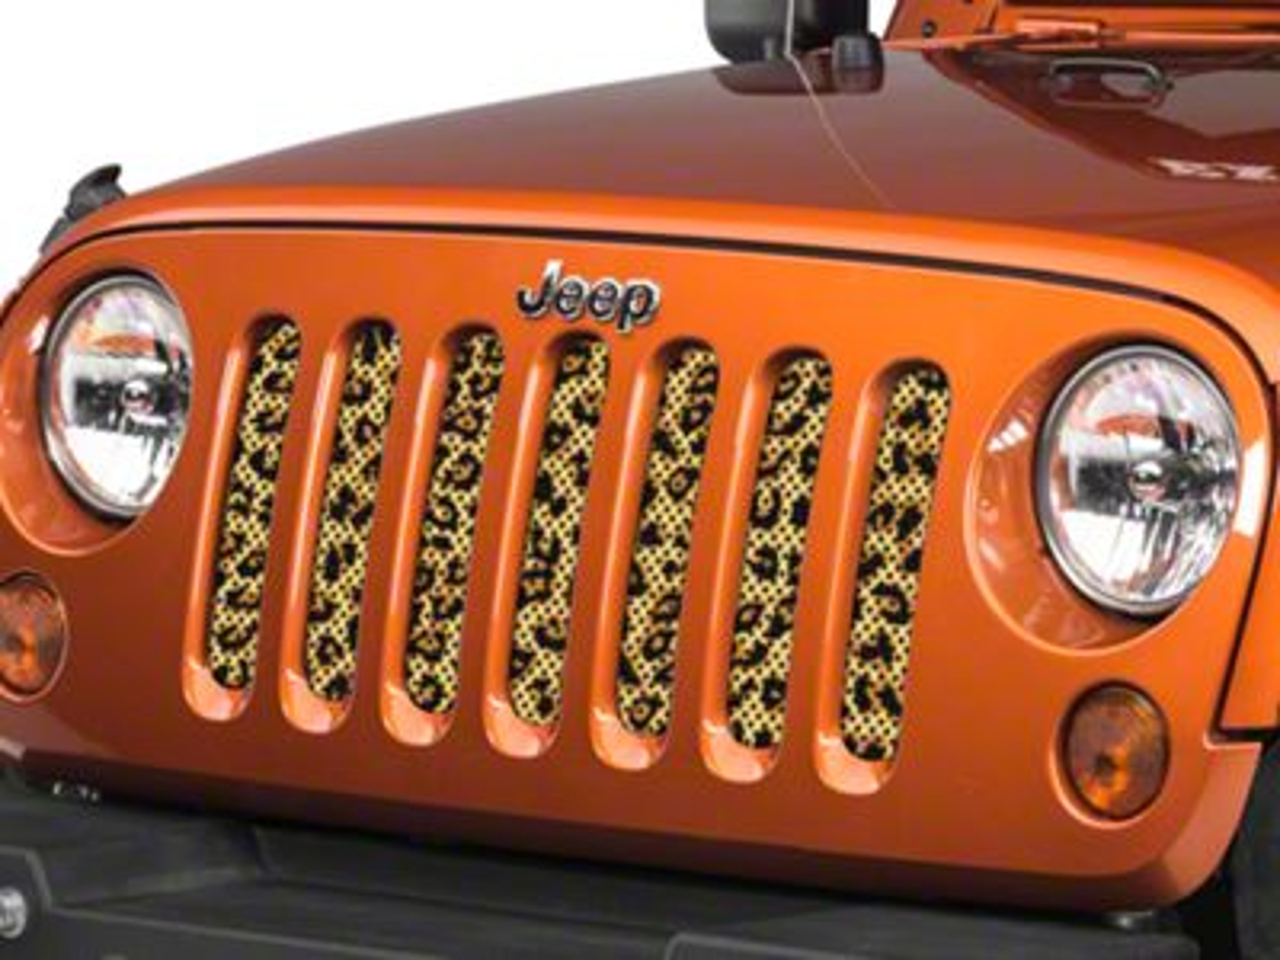 Under the Sun Grille Insert - Leopard Print (07-18 Jeep Wrangler JK)